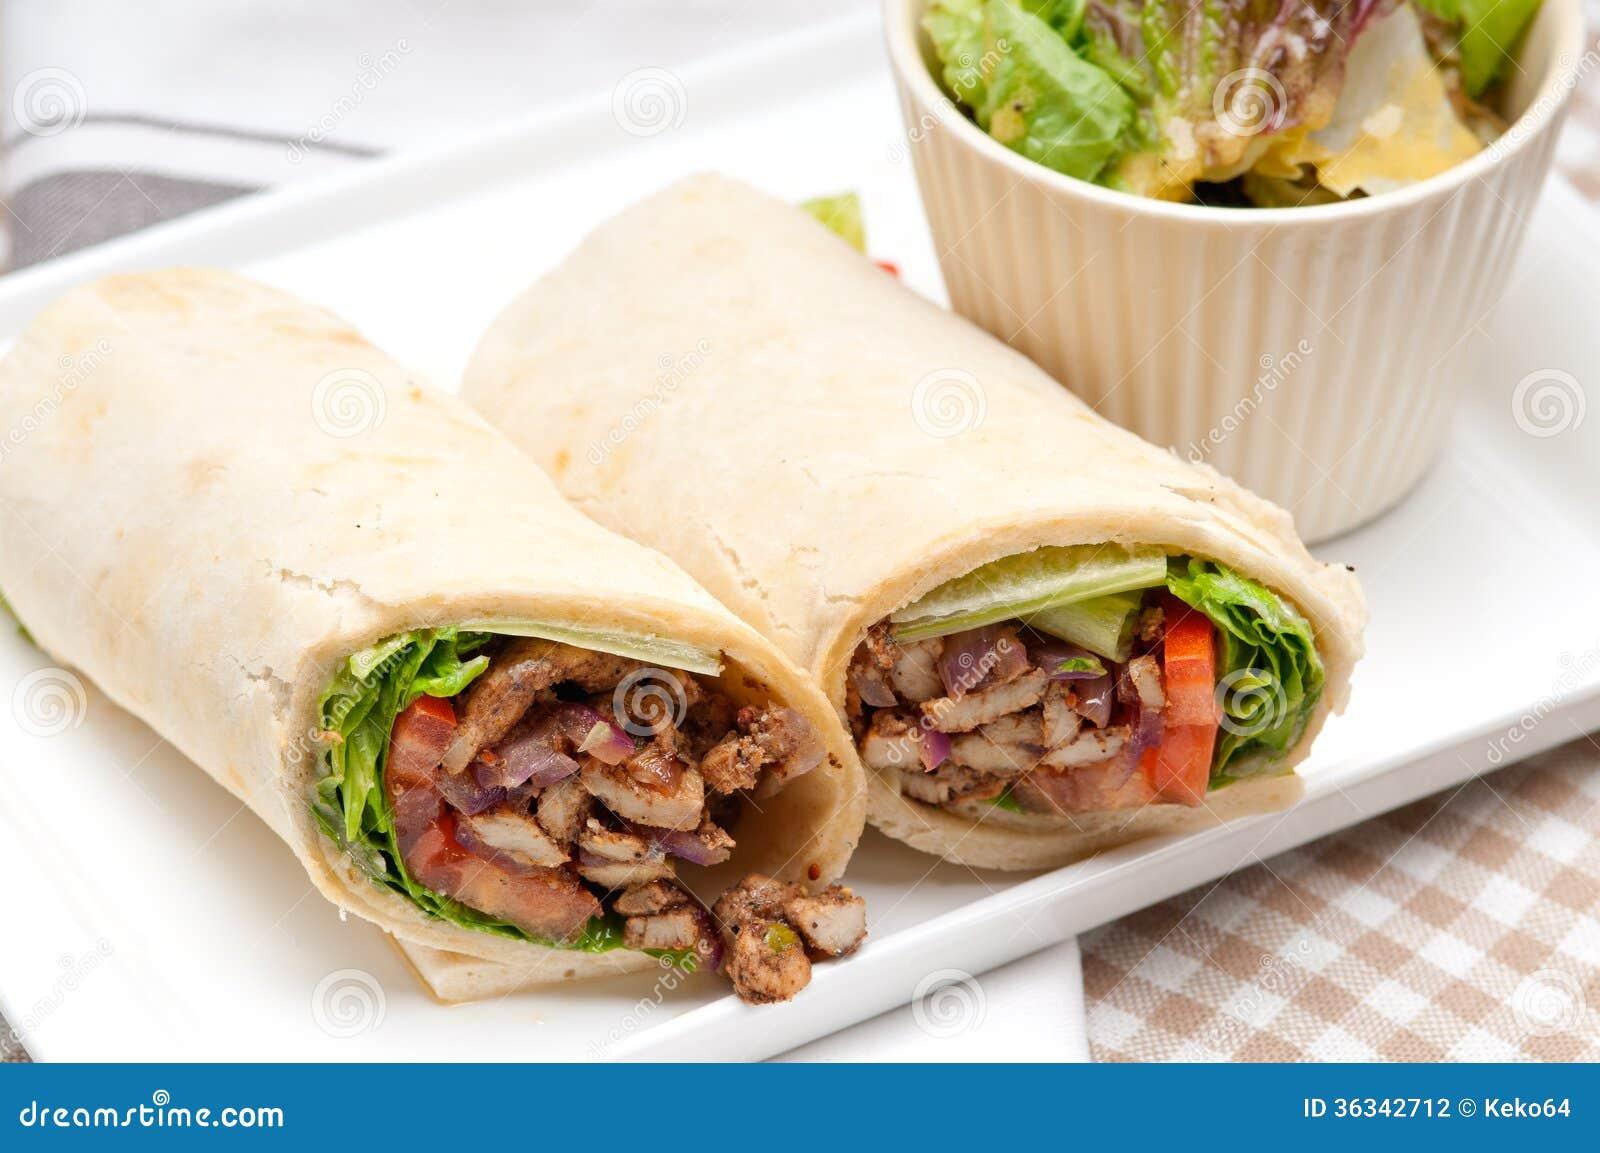 Chicken shawarma roll - photo#7